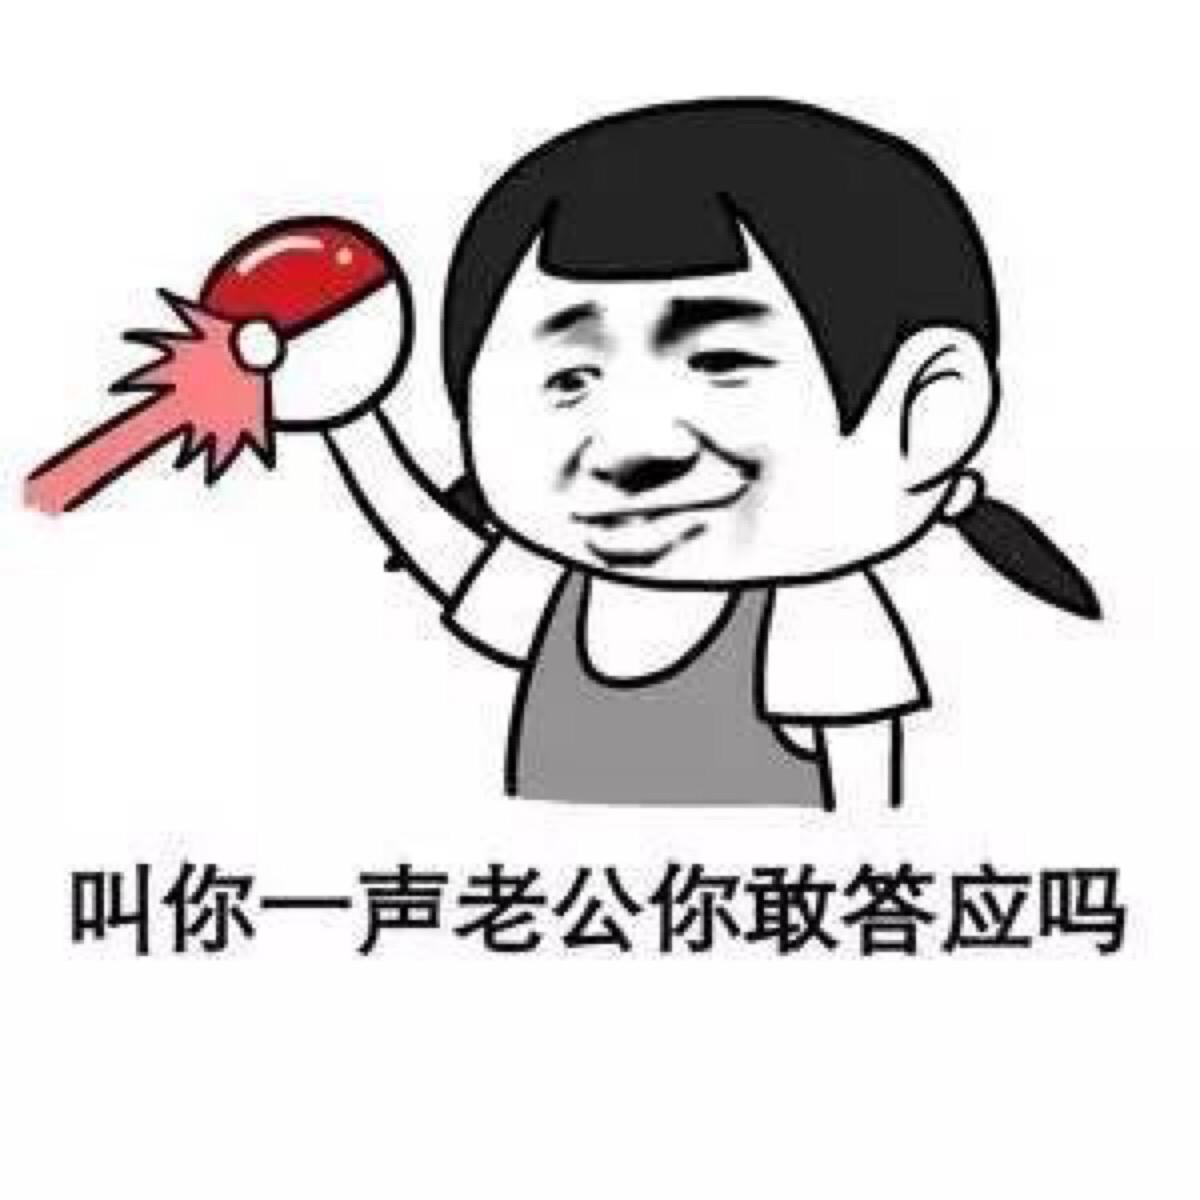 怼怼大玥子 messages sticker-6